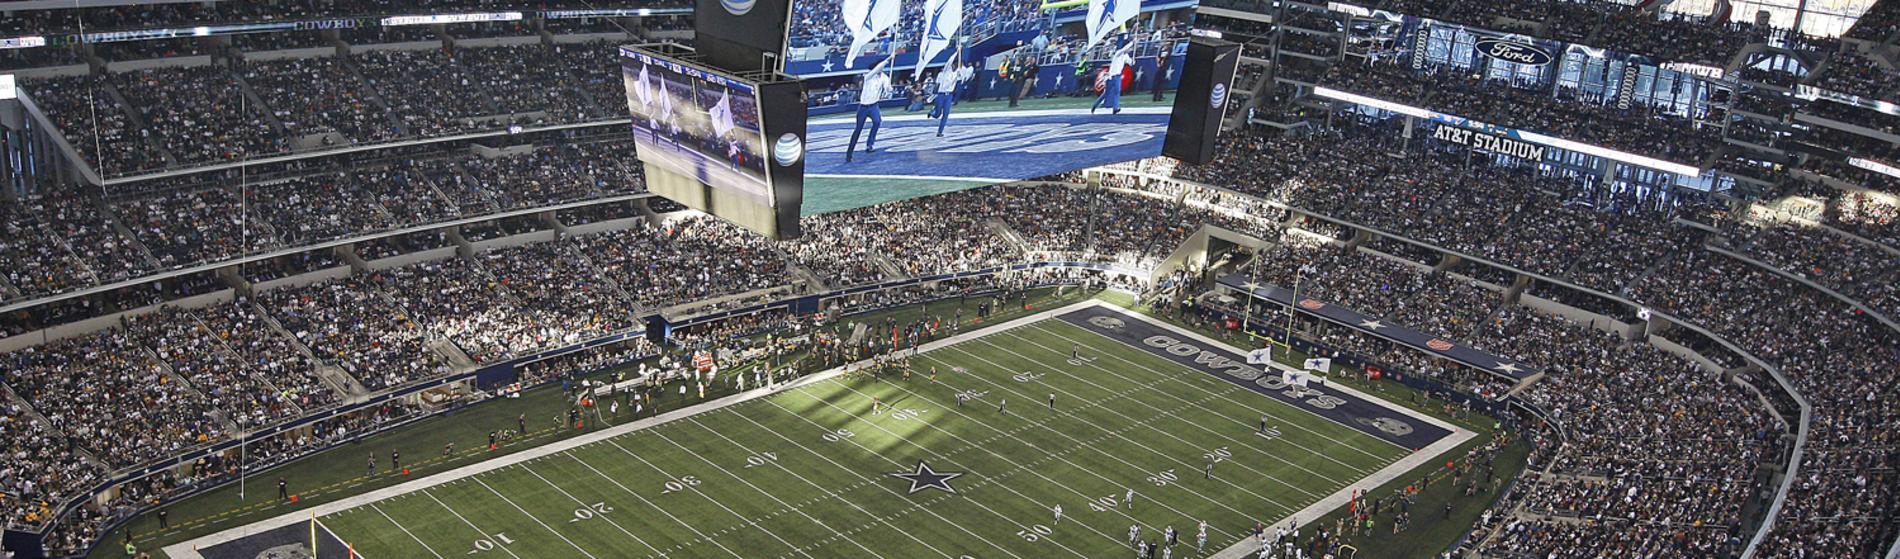 AT&T Stadium Sports Hero Image